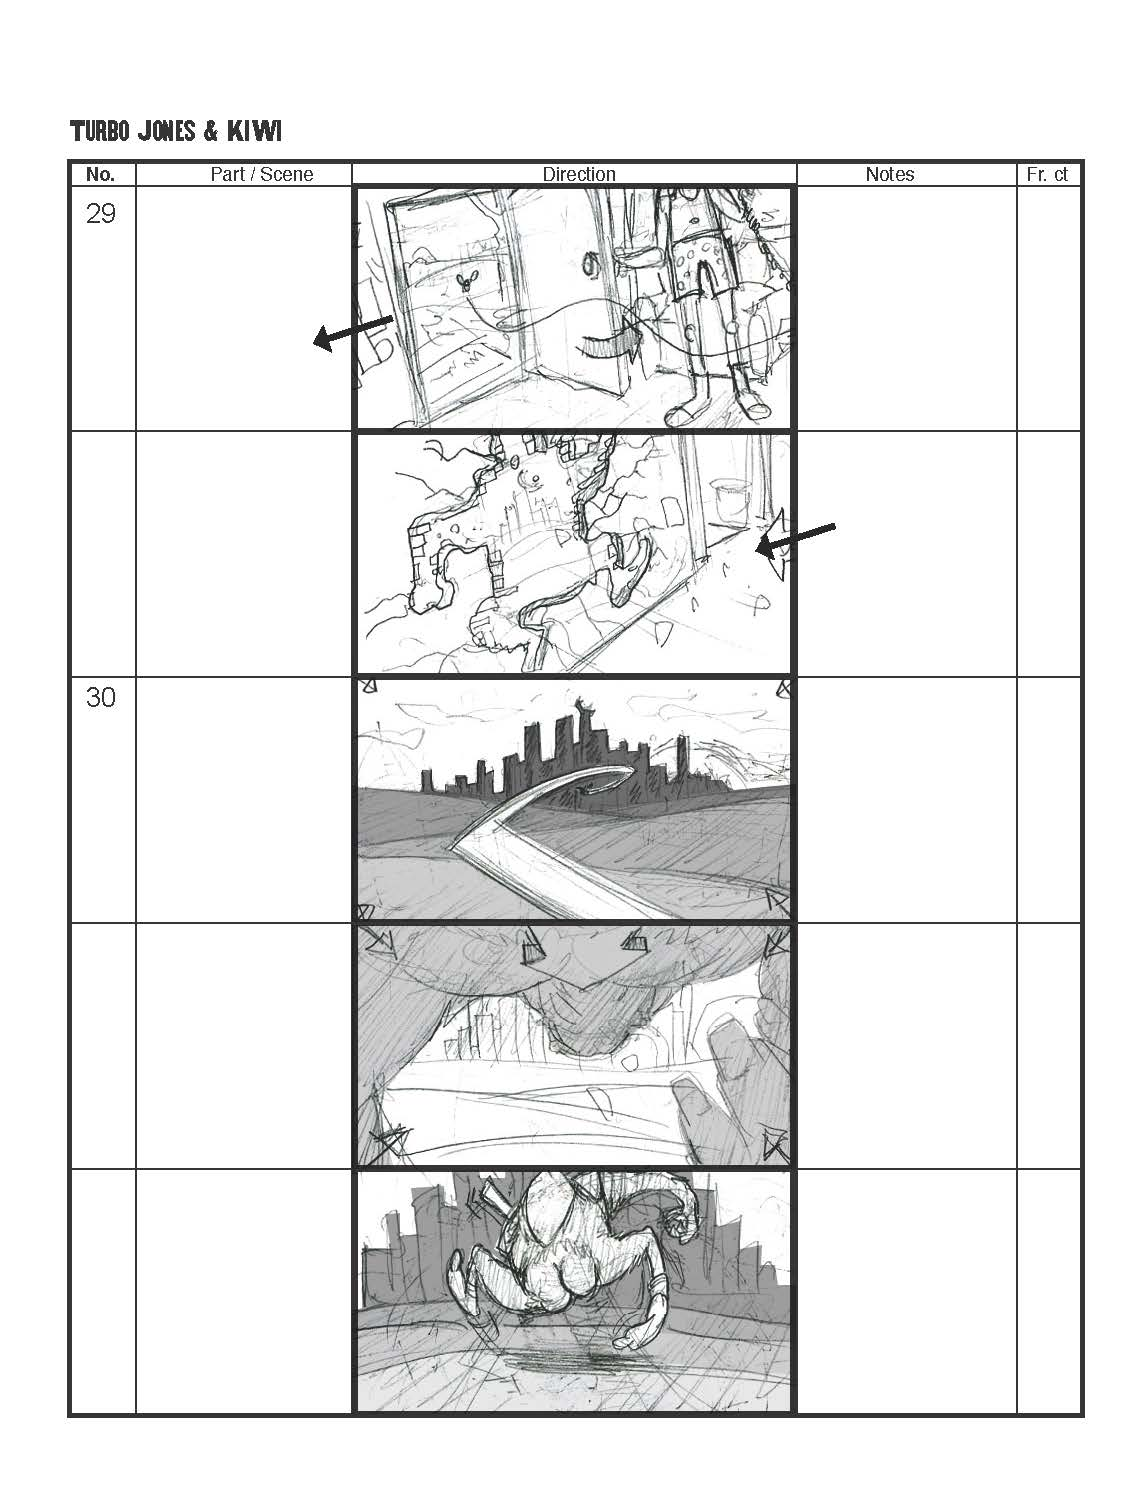 TJK_Storyboards_v01_HIGH_Page_15.jpg